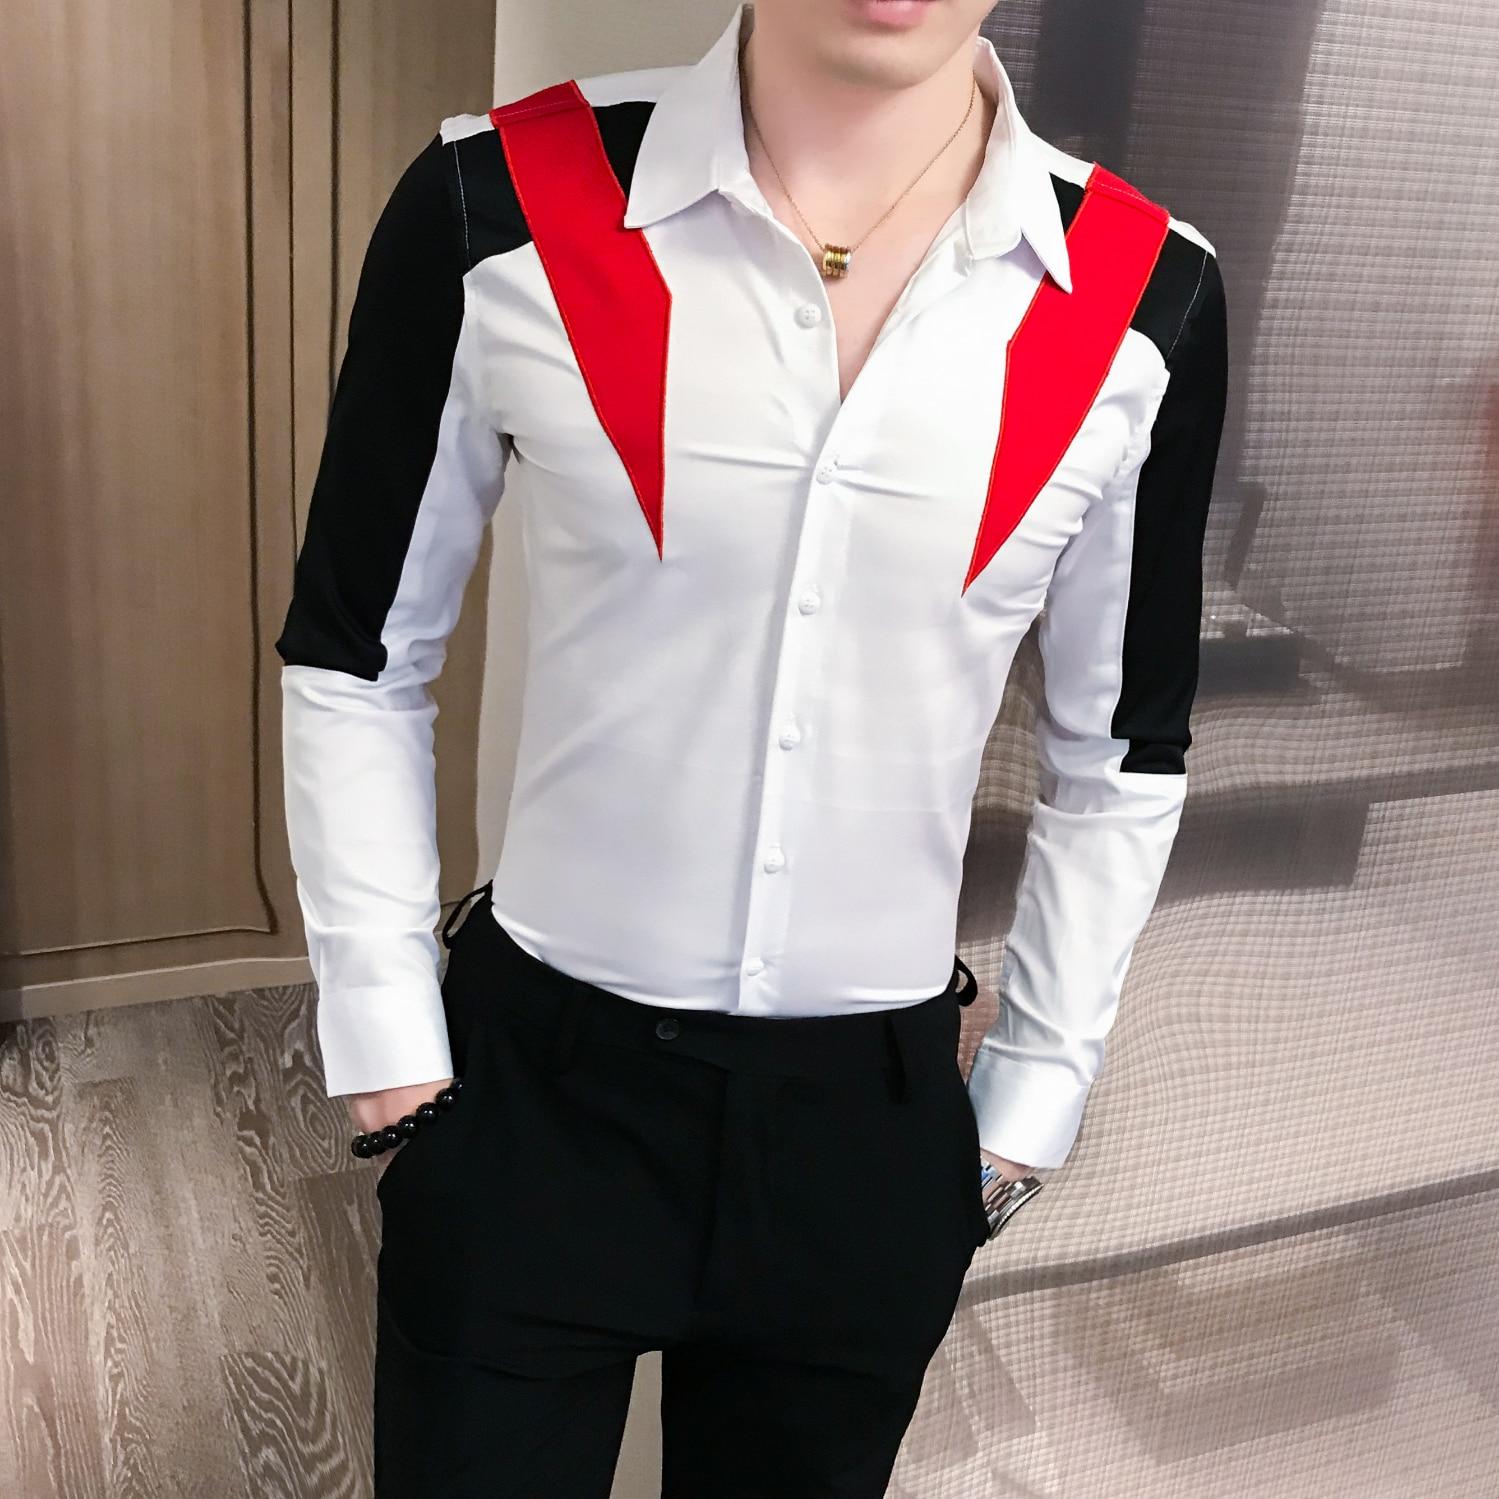 Casual Shirts Club Tuxedo 3XL-M Sale Men Shirt 2019 Autumn New Contrast Color Patchwork Shirt Men Long Sleeve Pullover Mens